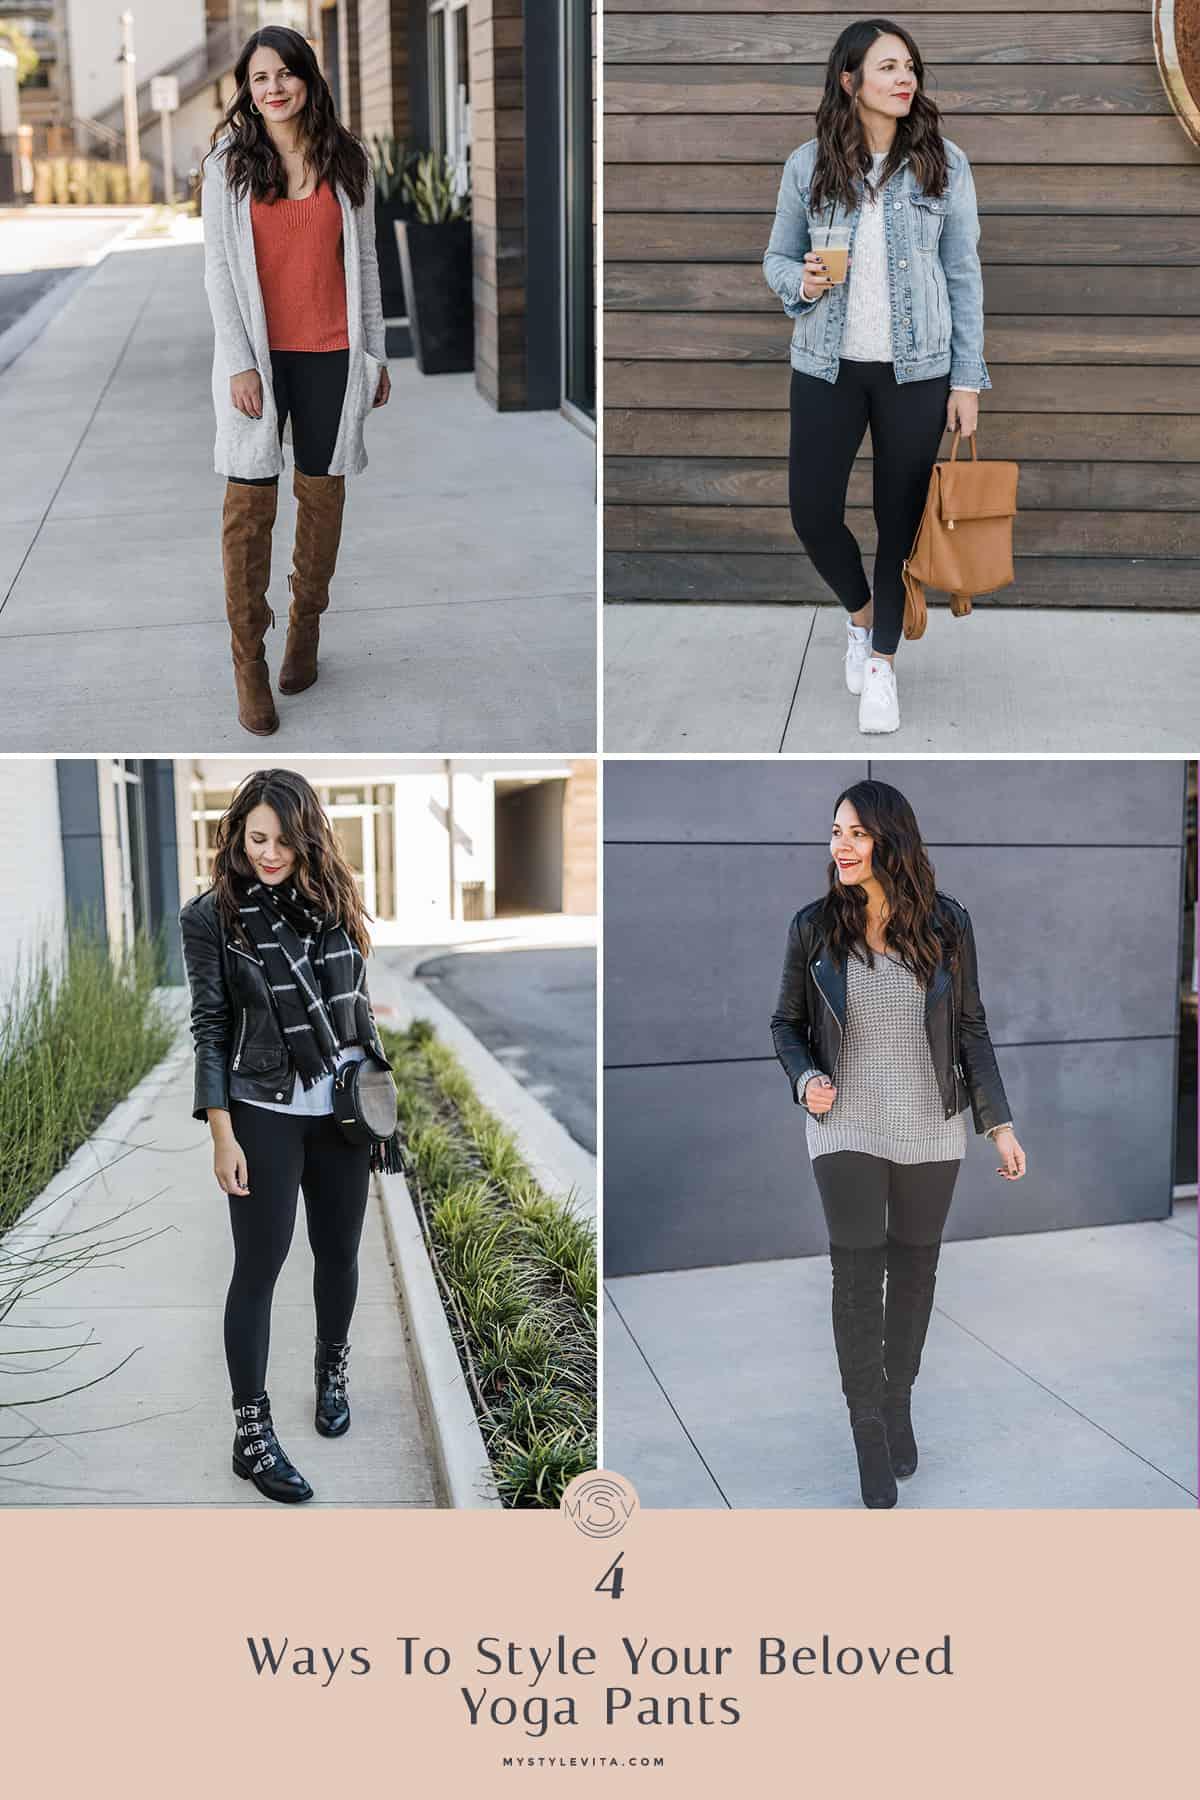 4 Ways To Style Yoga Pants - #yogapants #outfitideas @mystylevita